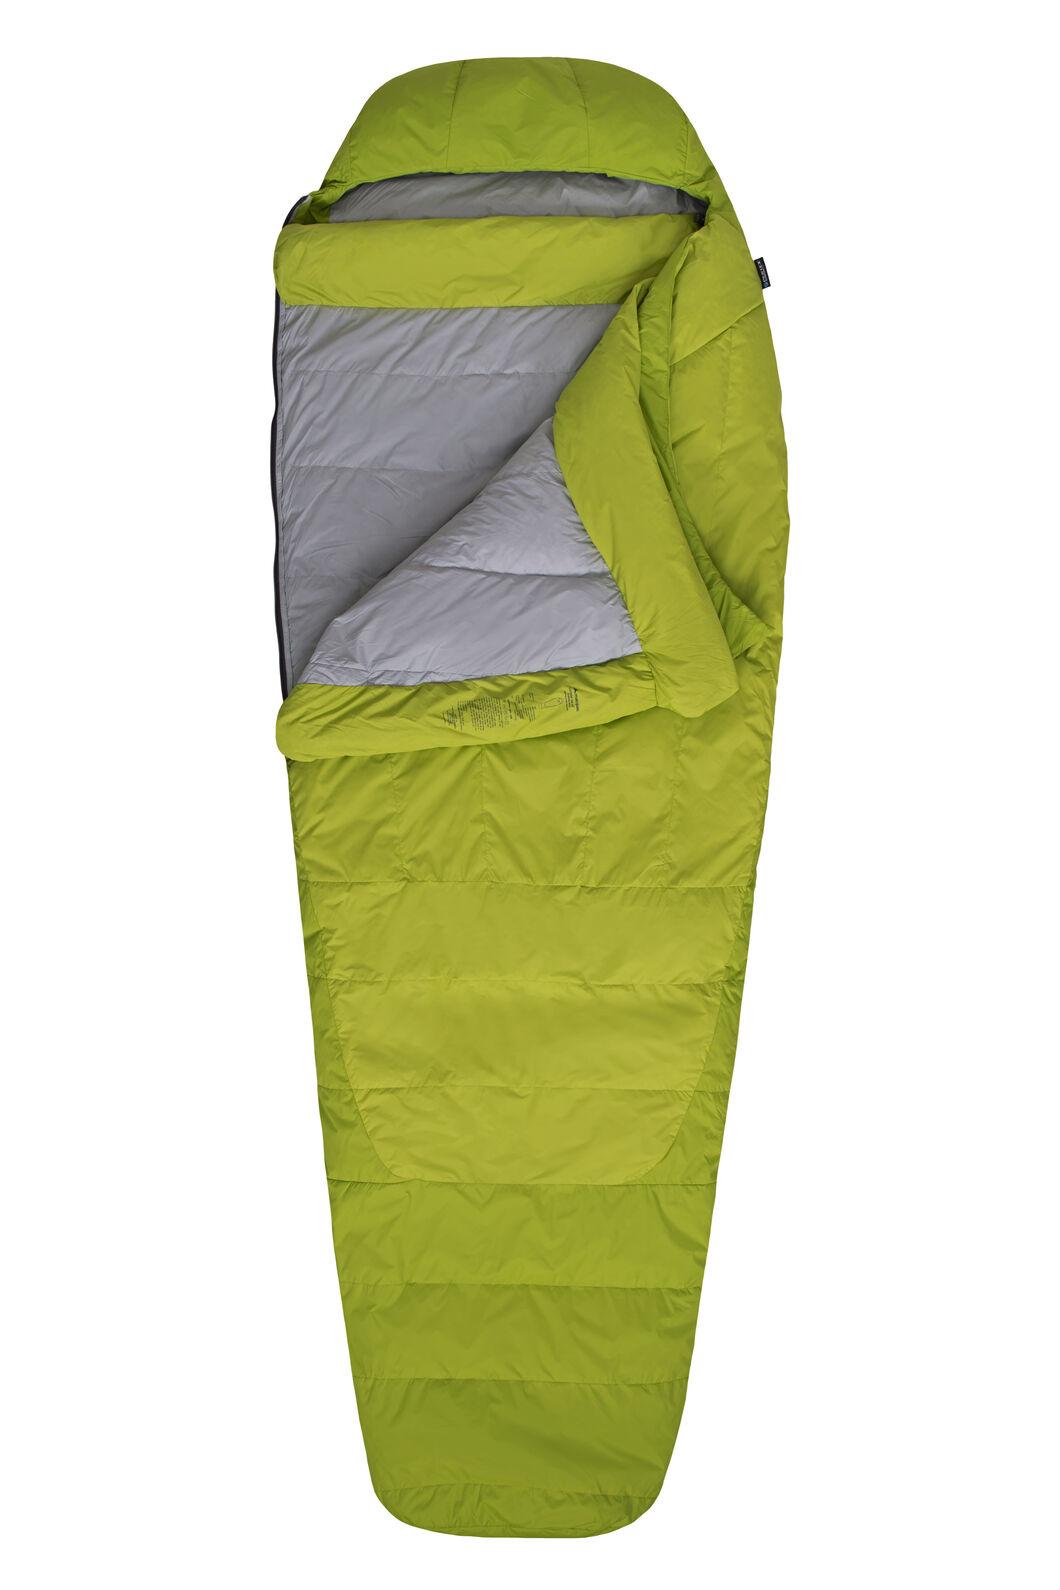 Macpac Latitude XP Goose Down 700 Sleeping Bag - Extra Large, Tender Shoots, hi-res